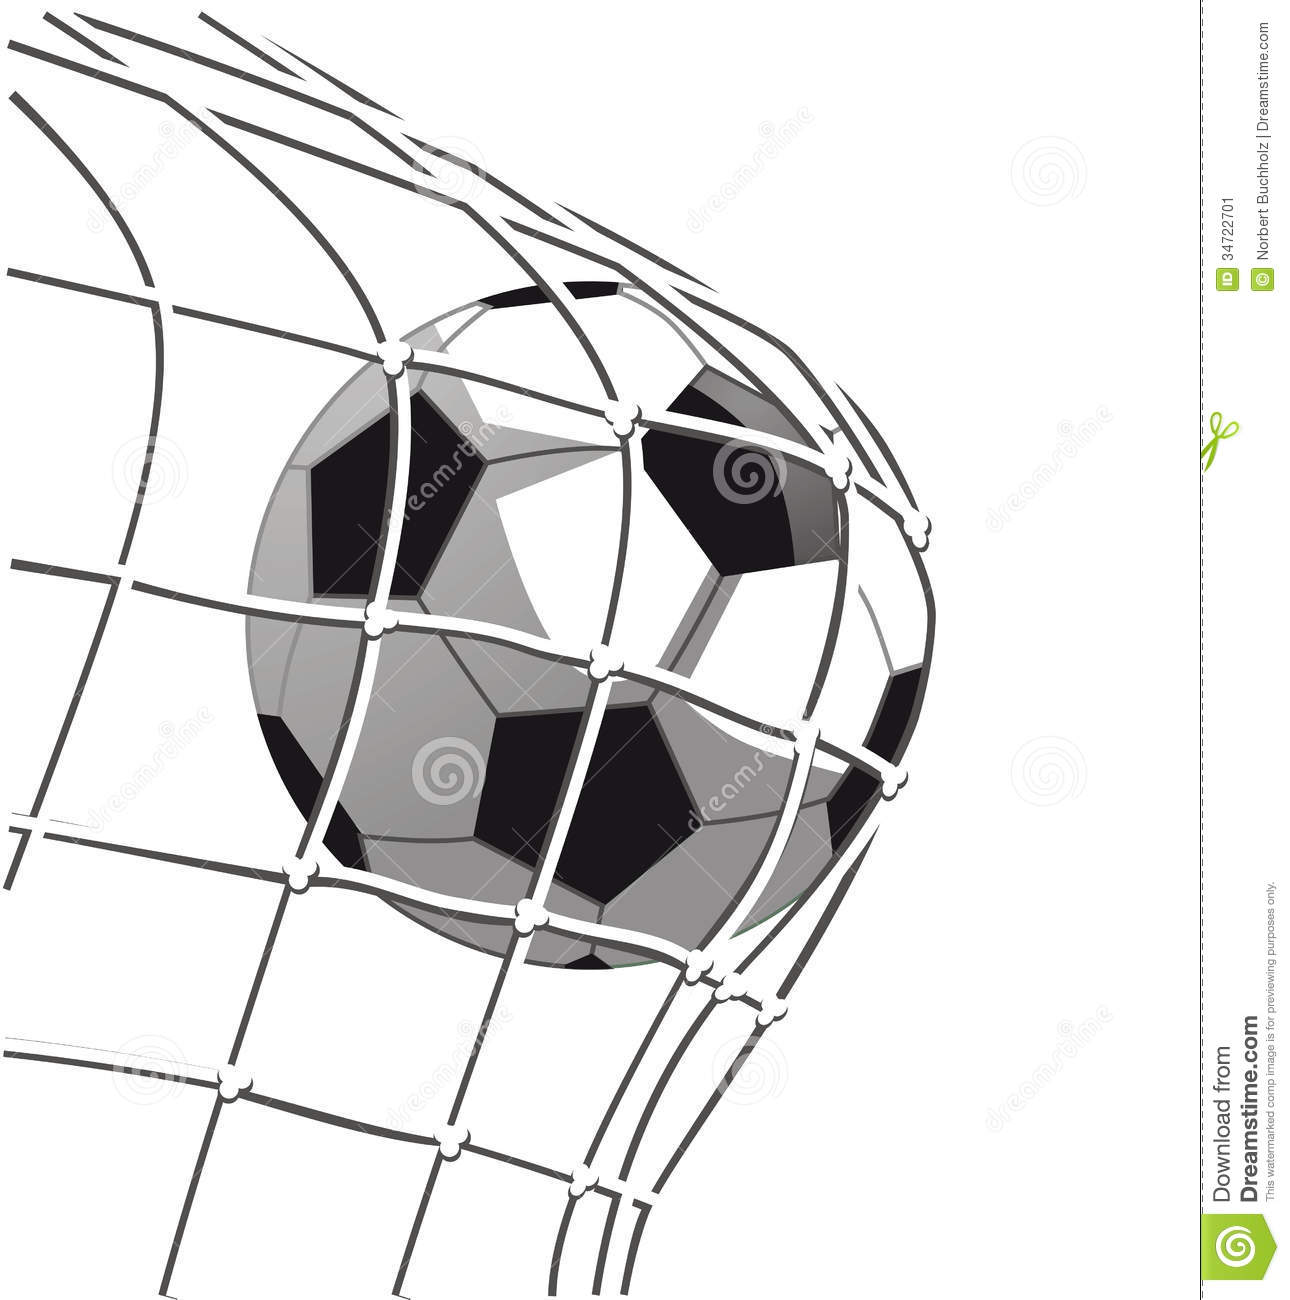 Soccer Goal Clipart - Clipart Kid